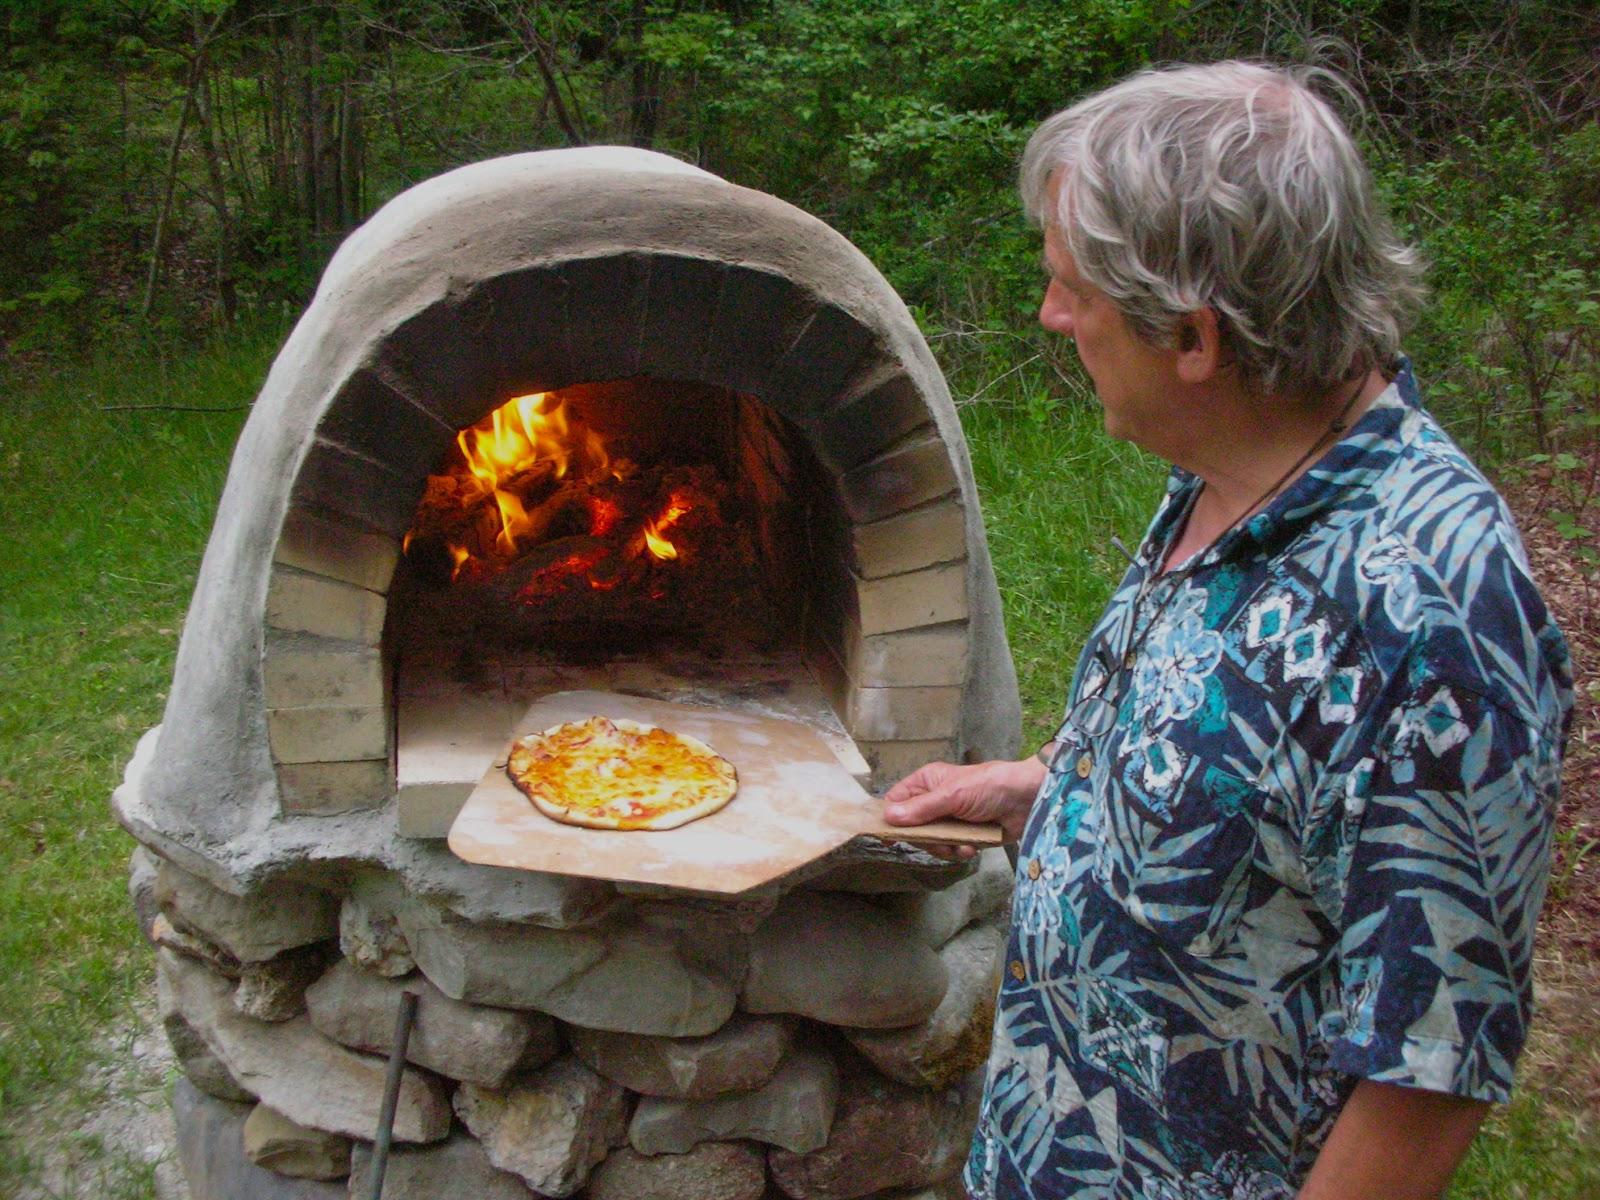 Breadhunter's Blog: Oven Building Workshops